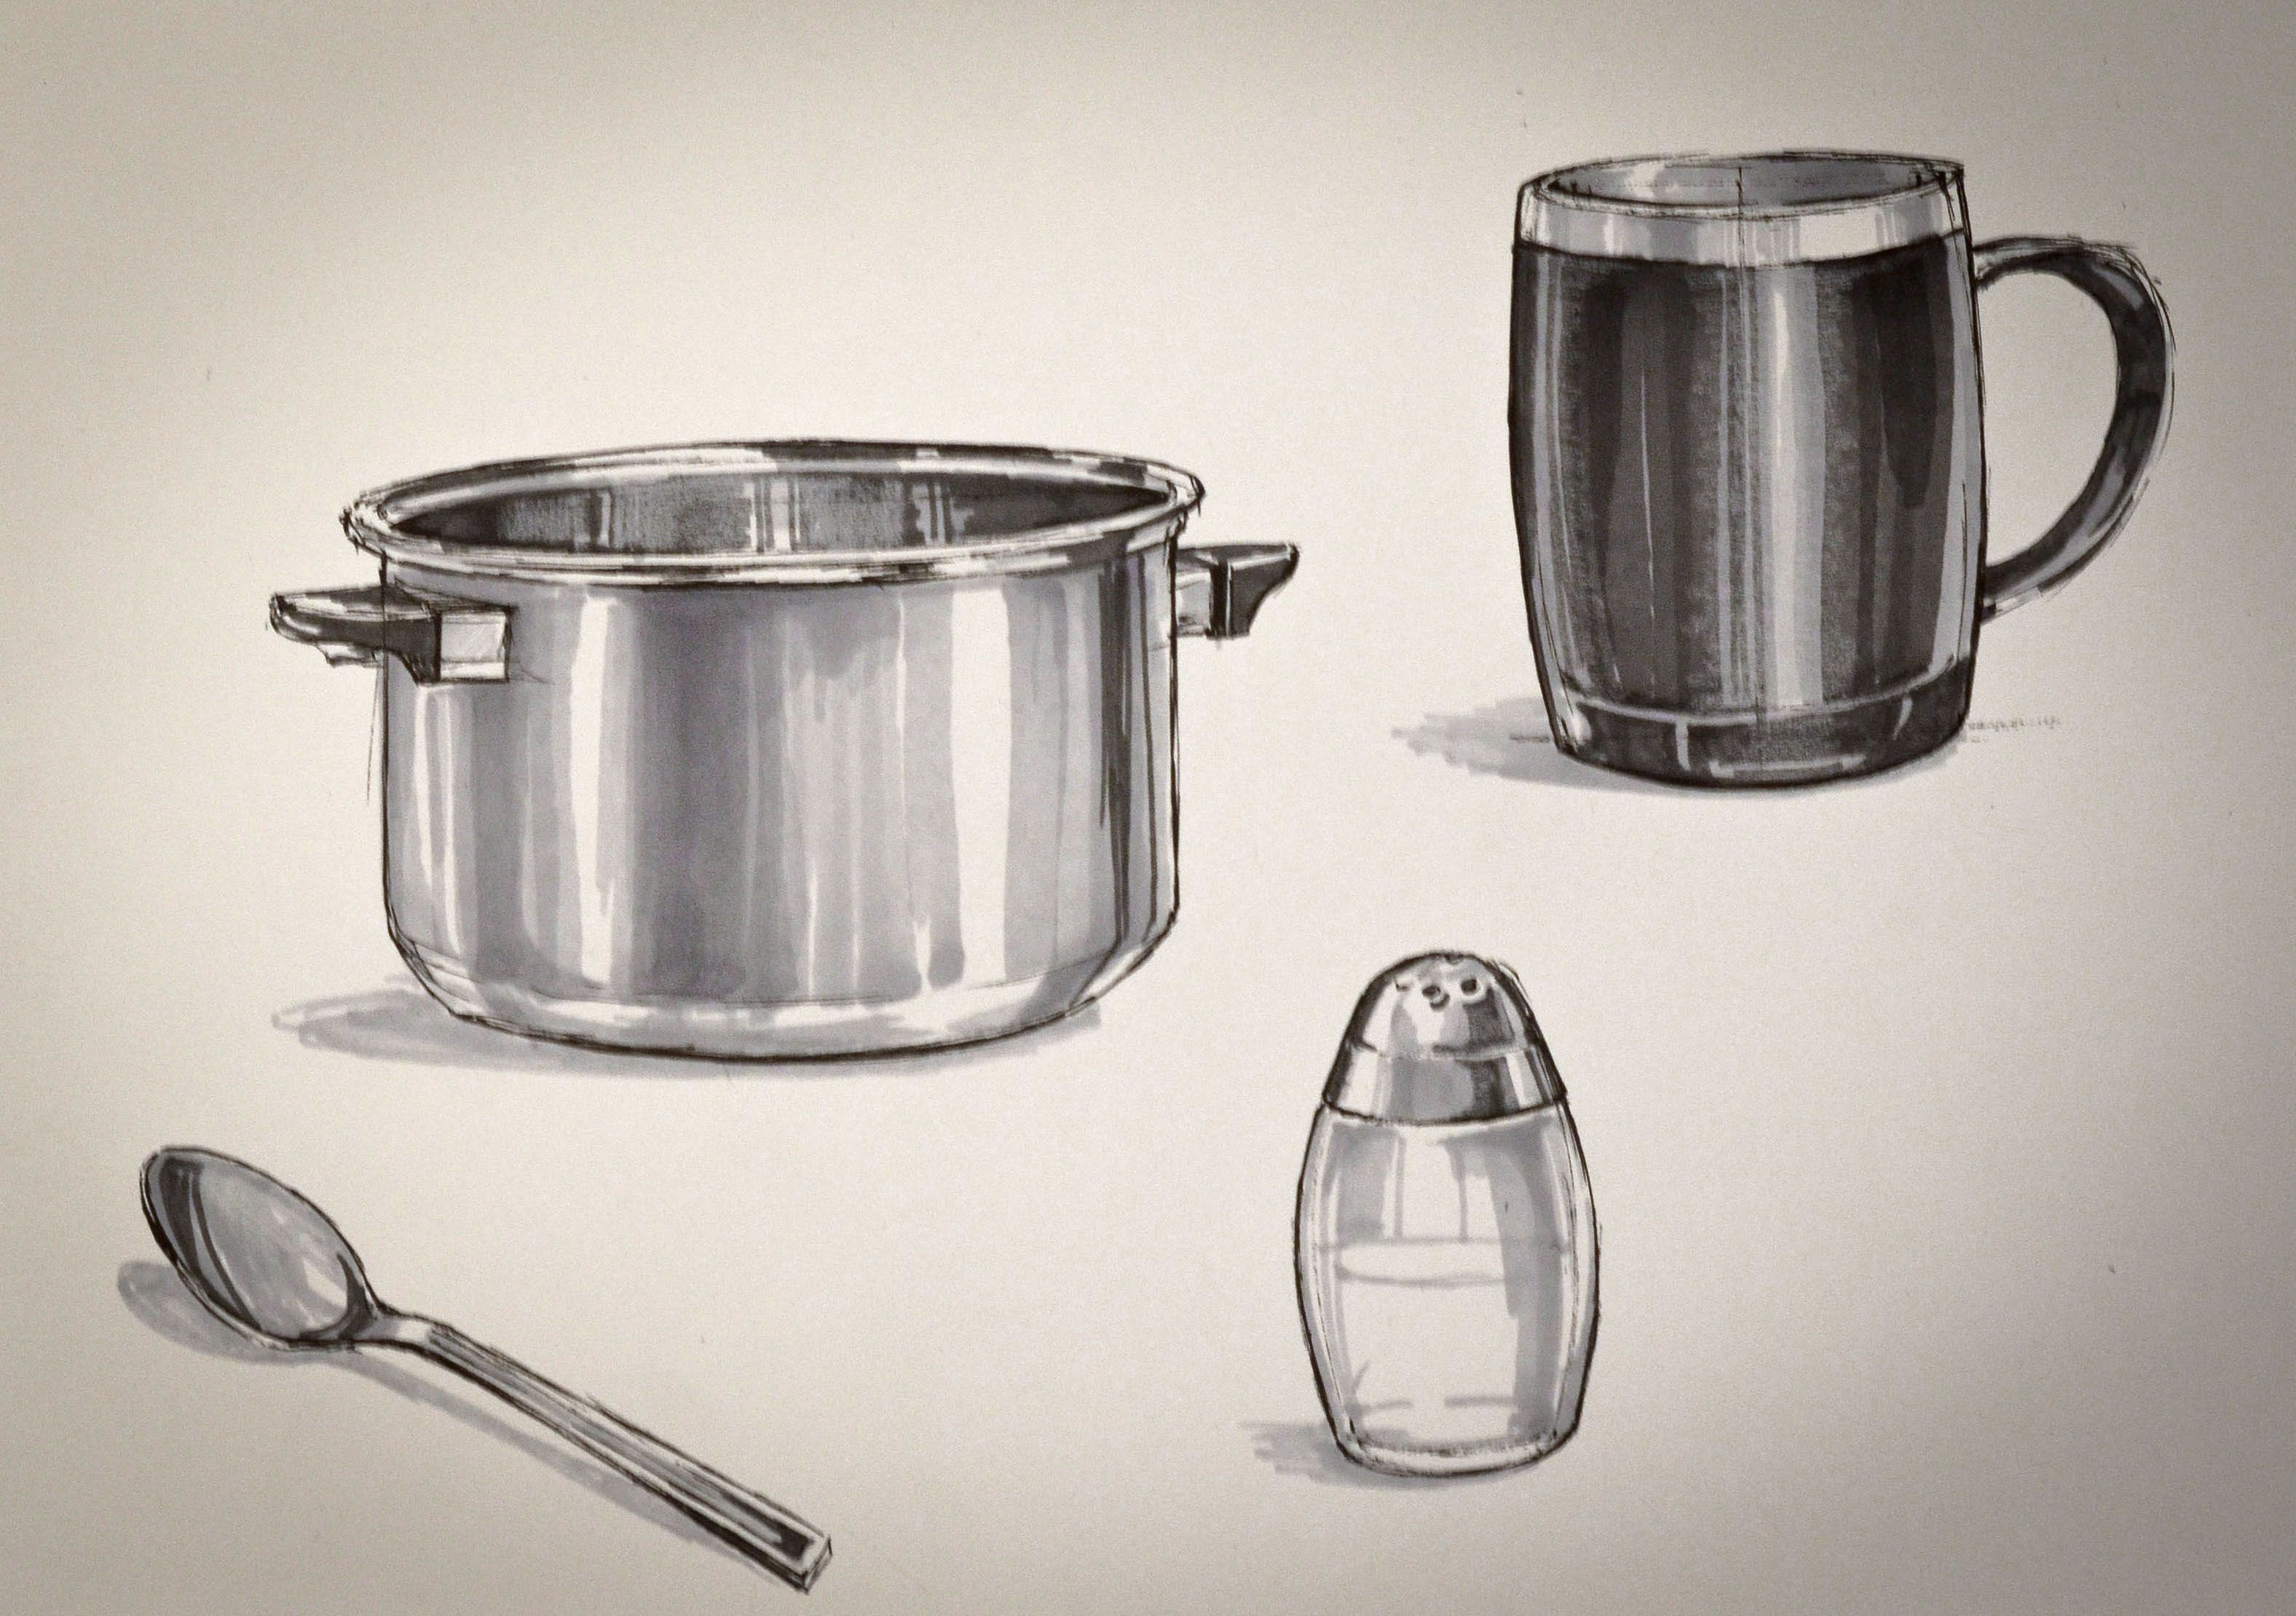 Iuliia Kalichkina (School of Form) product sketches